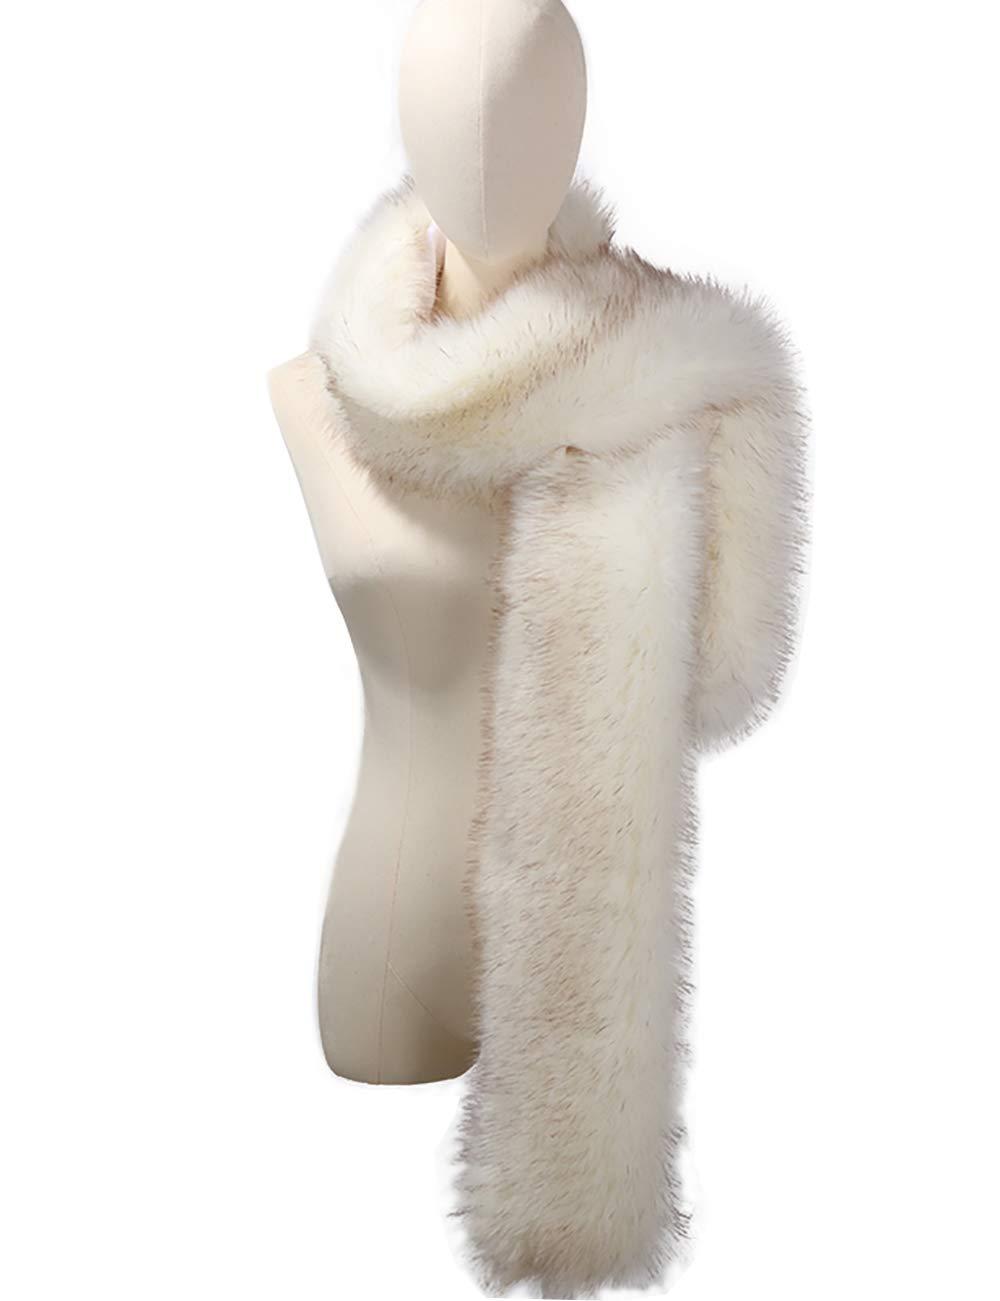 NAFLEAP Women Winter Warm Faux Fox Fur Scarf Collar Long Wrap Scarf Stole Shawl Shrug (White, Onesize)